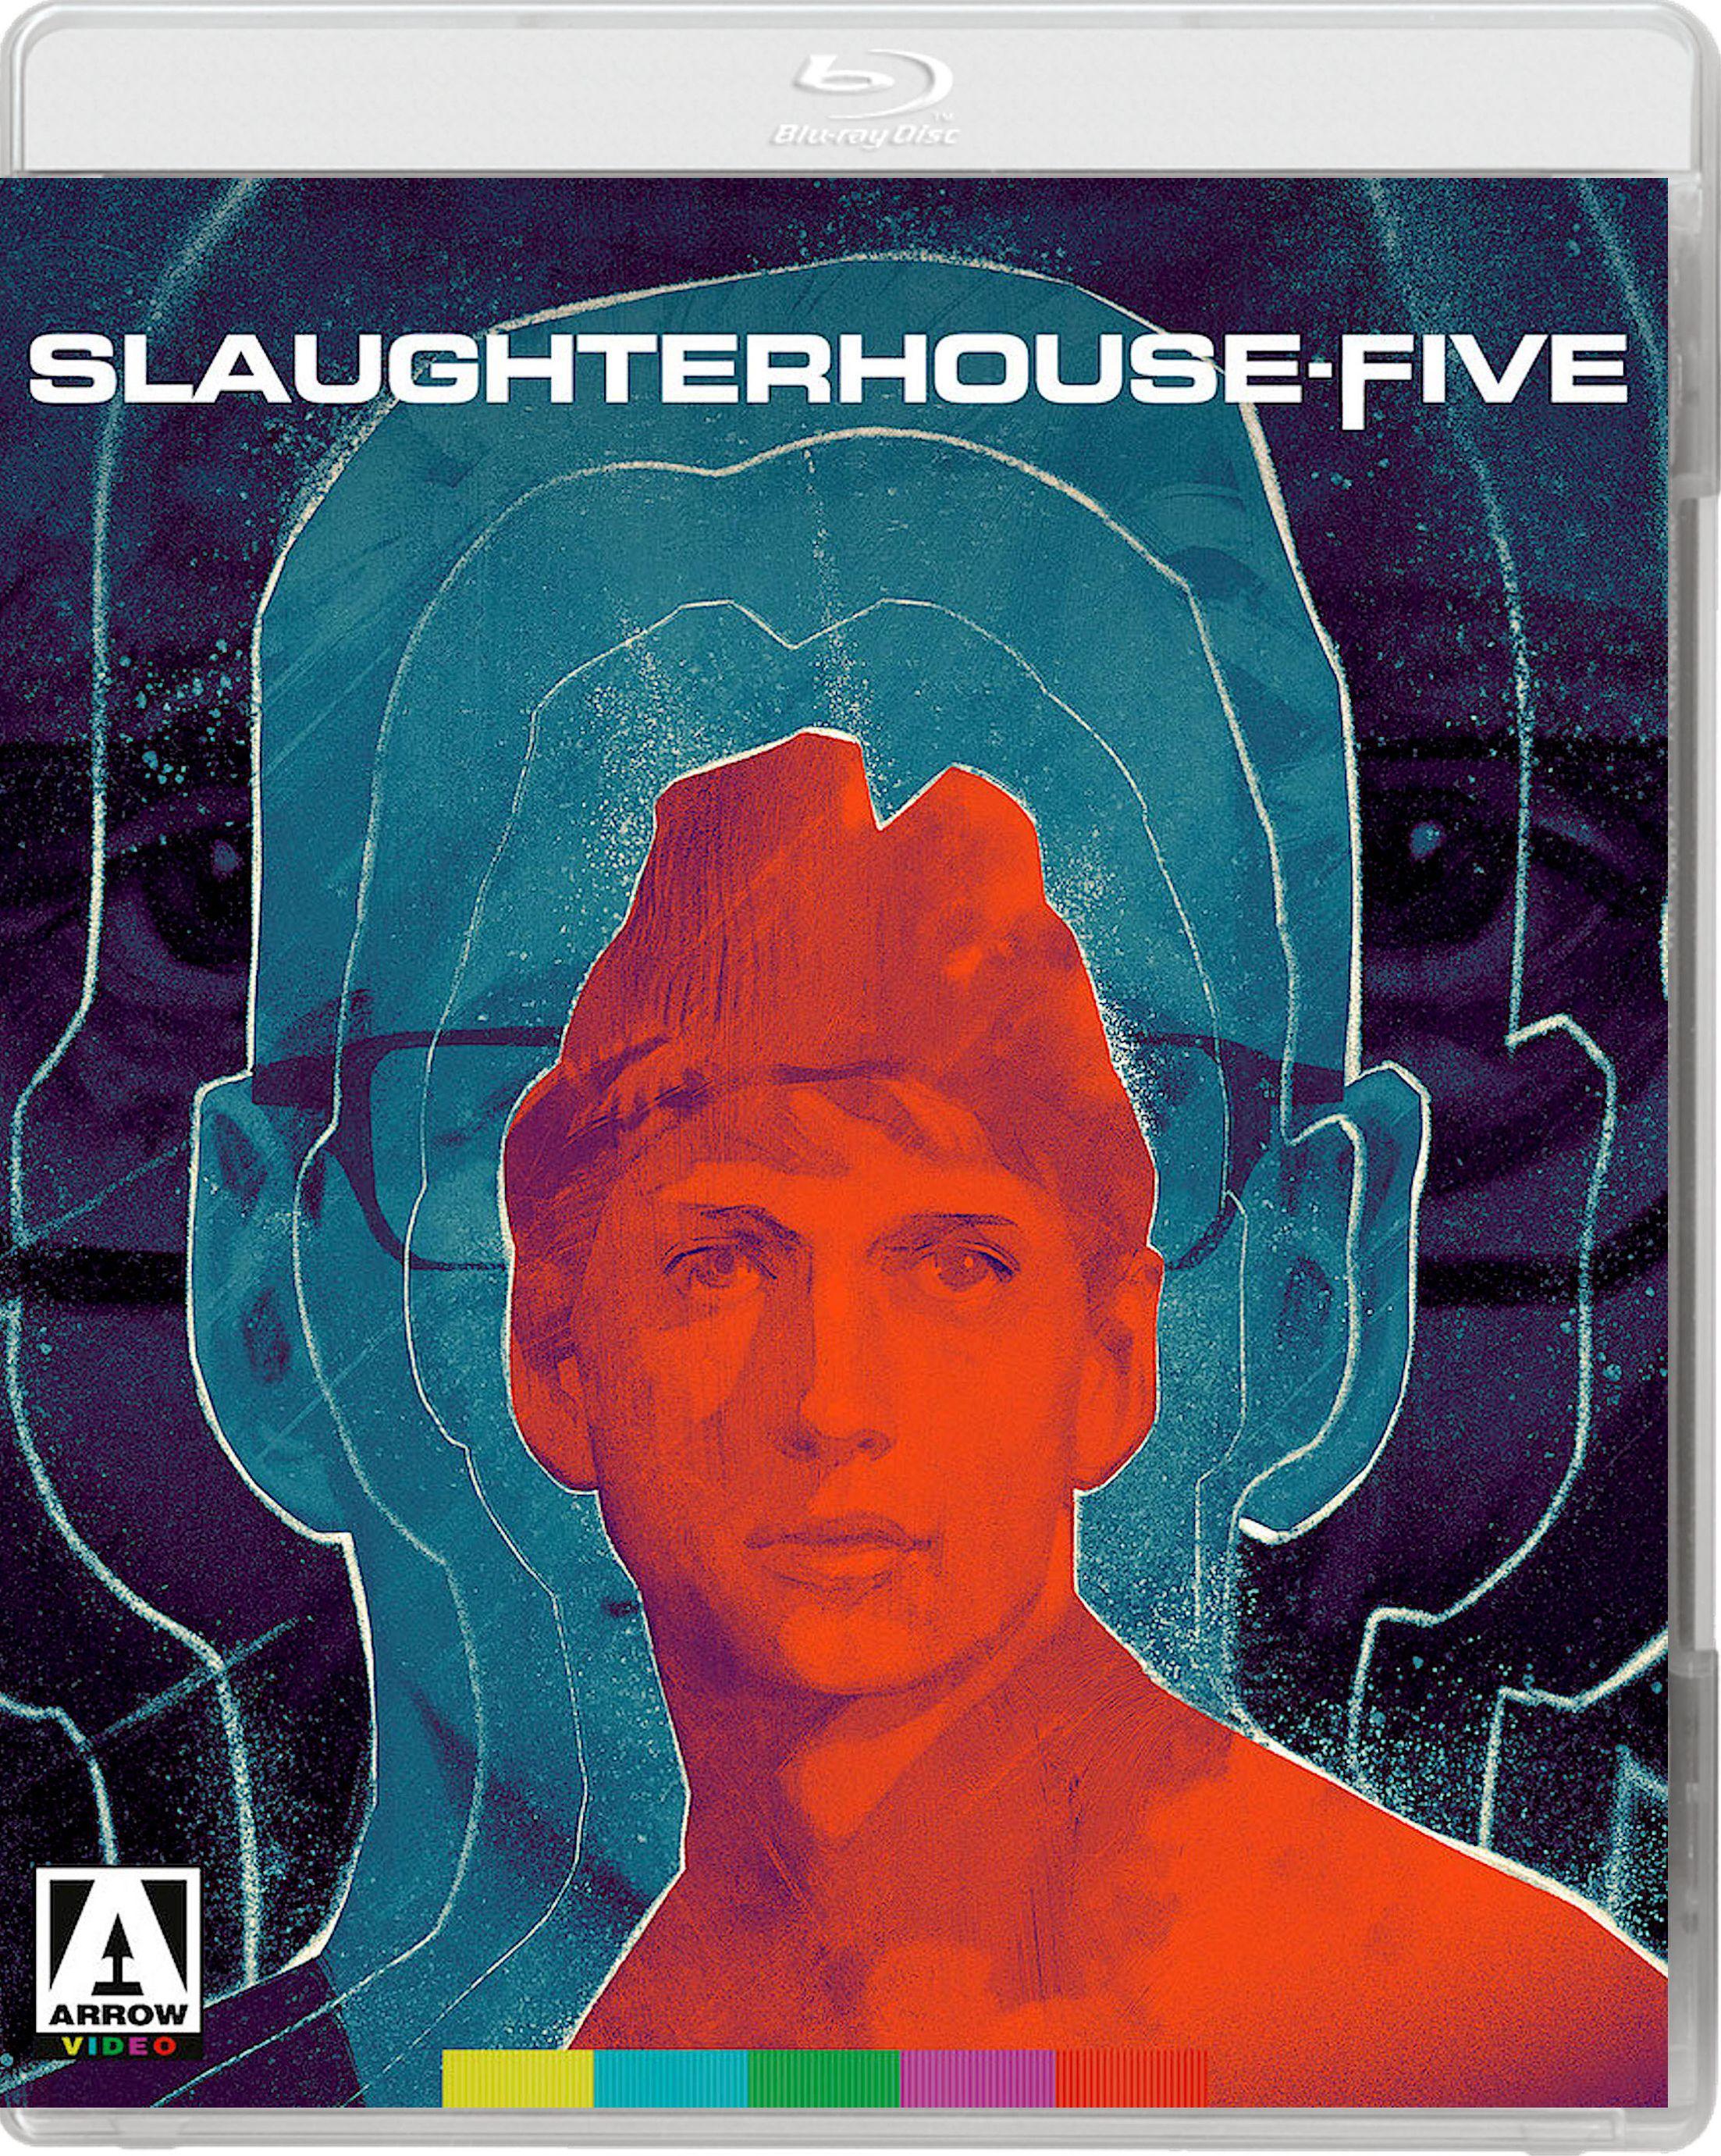 SLAUGHTERHOUSEFIVE BLURAY (ARROW US) Slaughterhouse